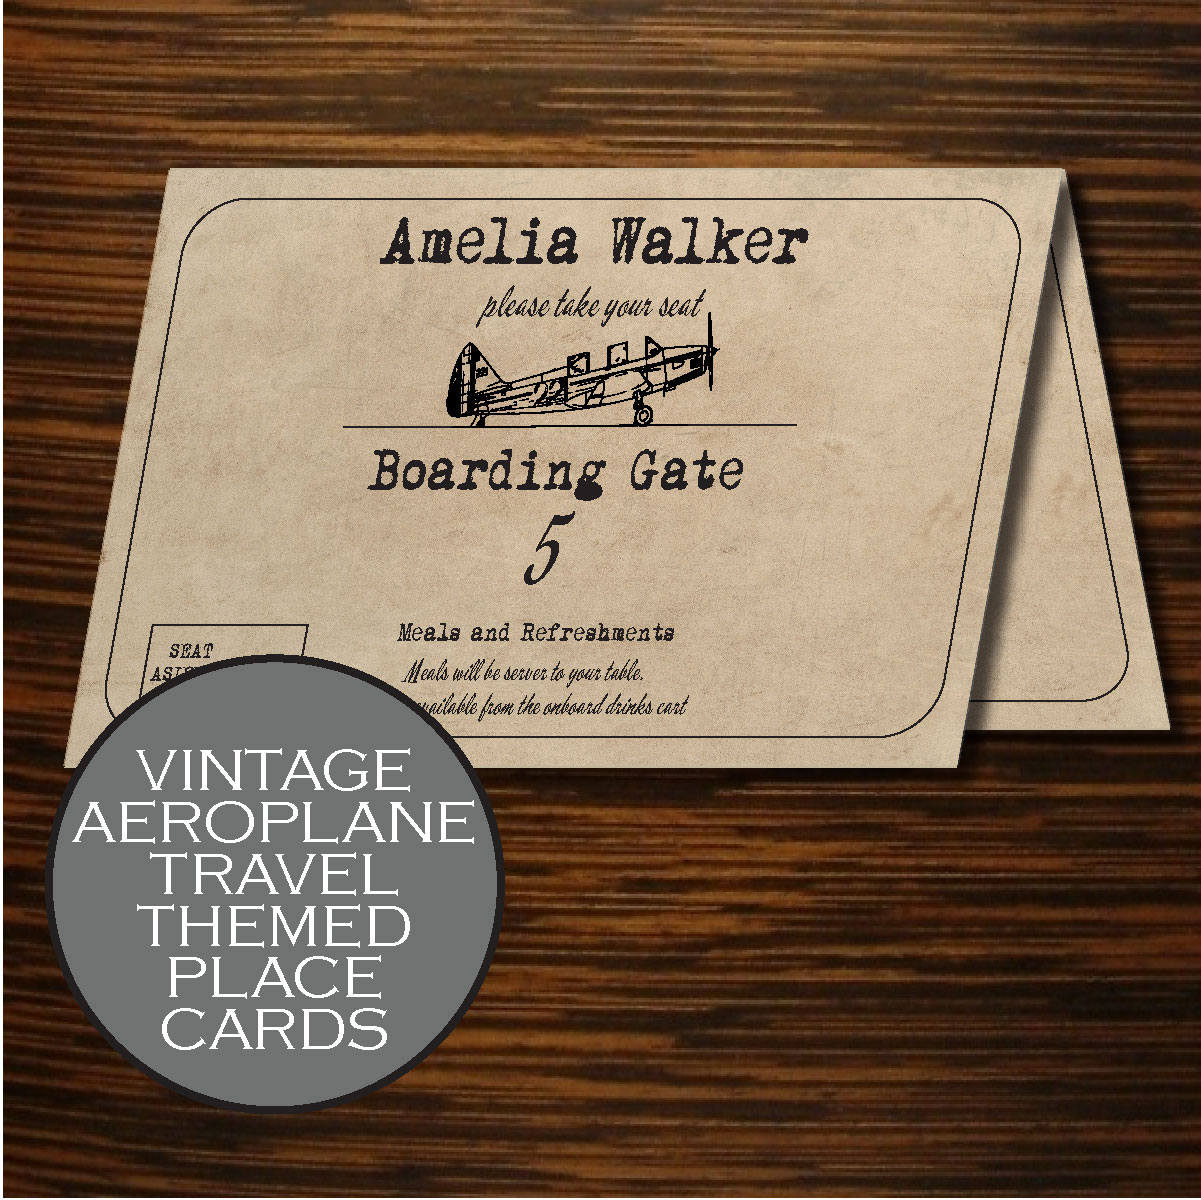 Travel Themed Wedding Travel Place Cards Vintage Aeroplane